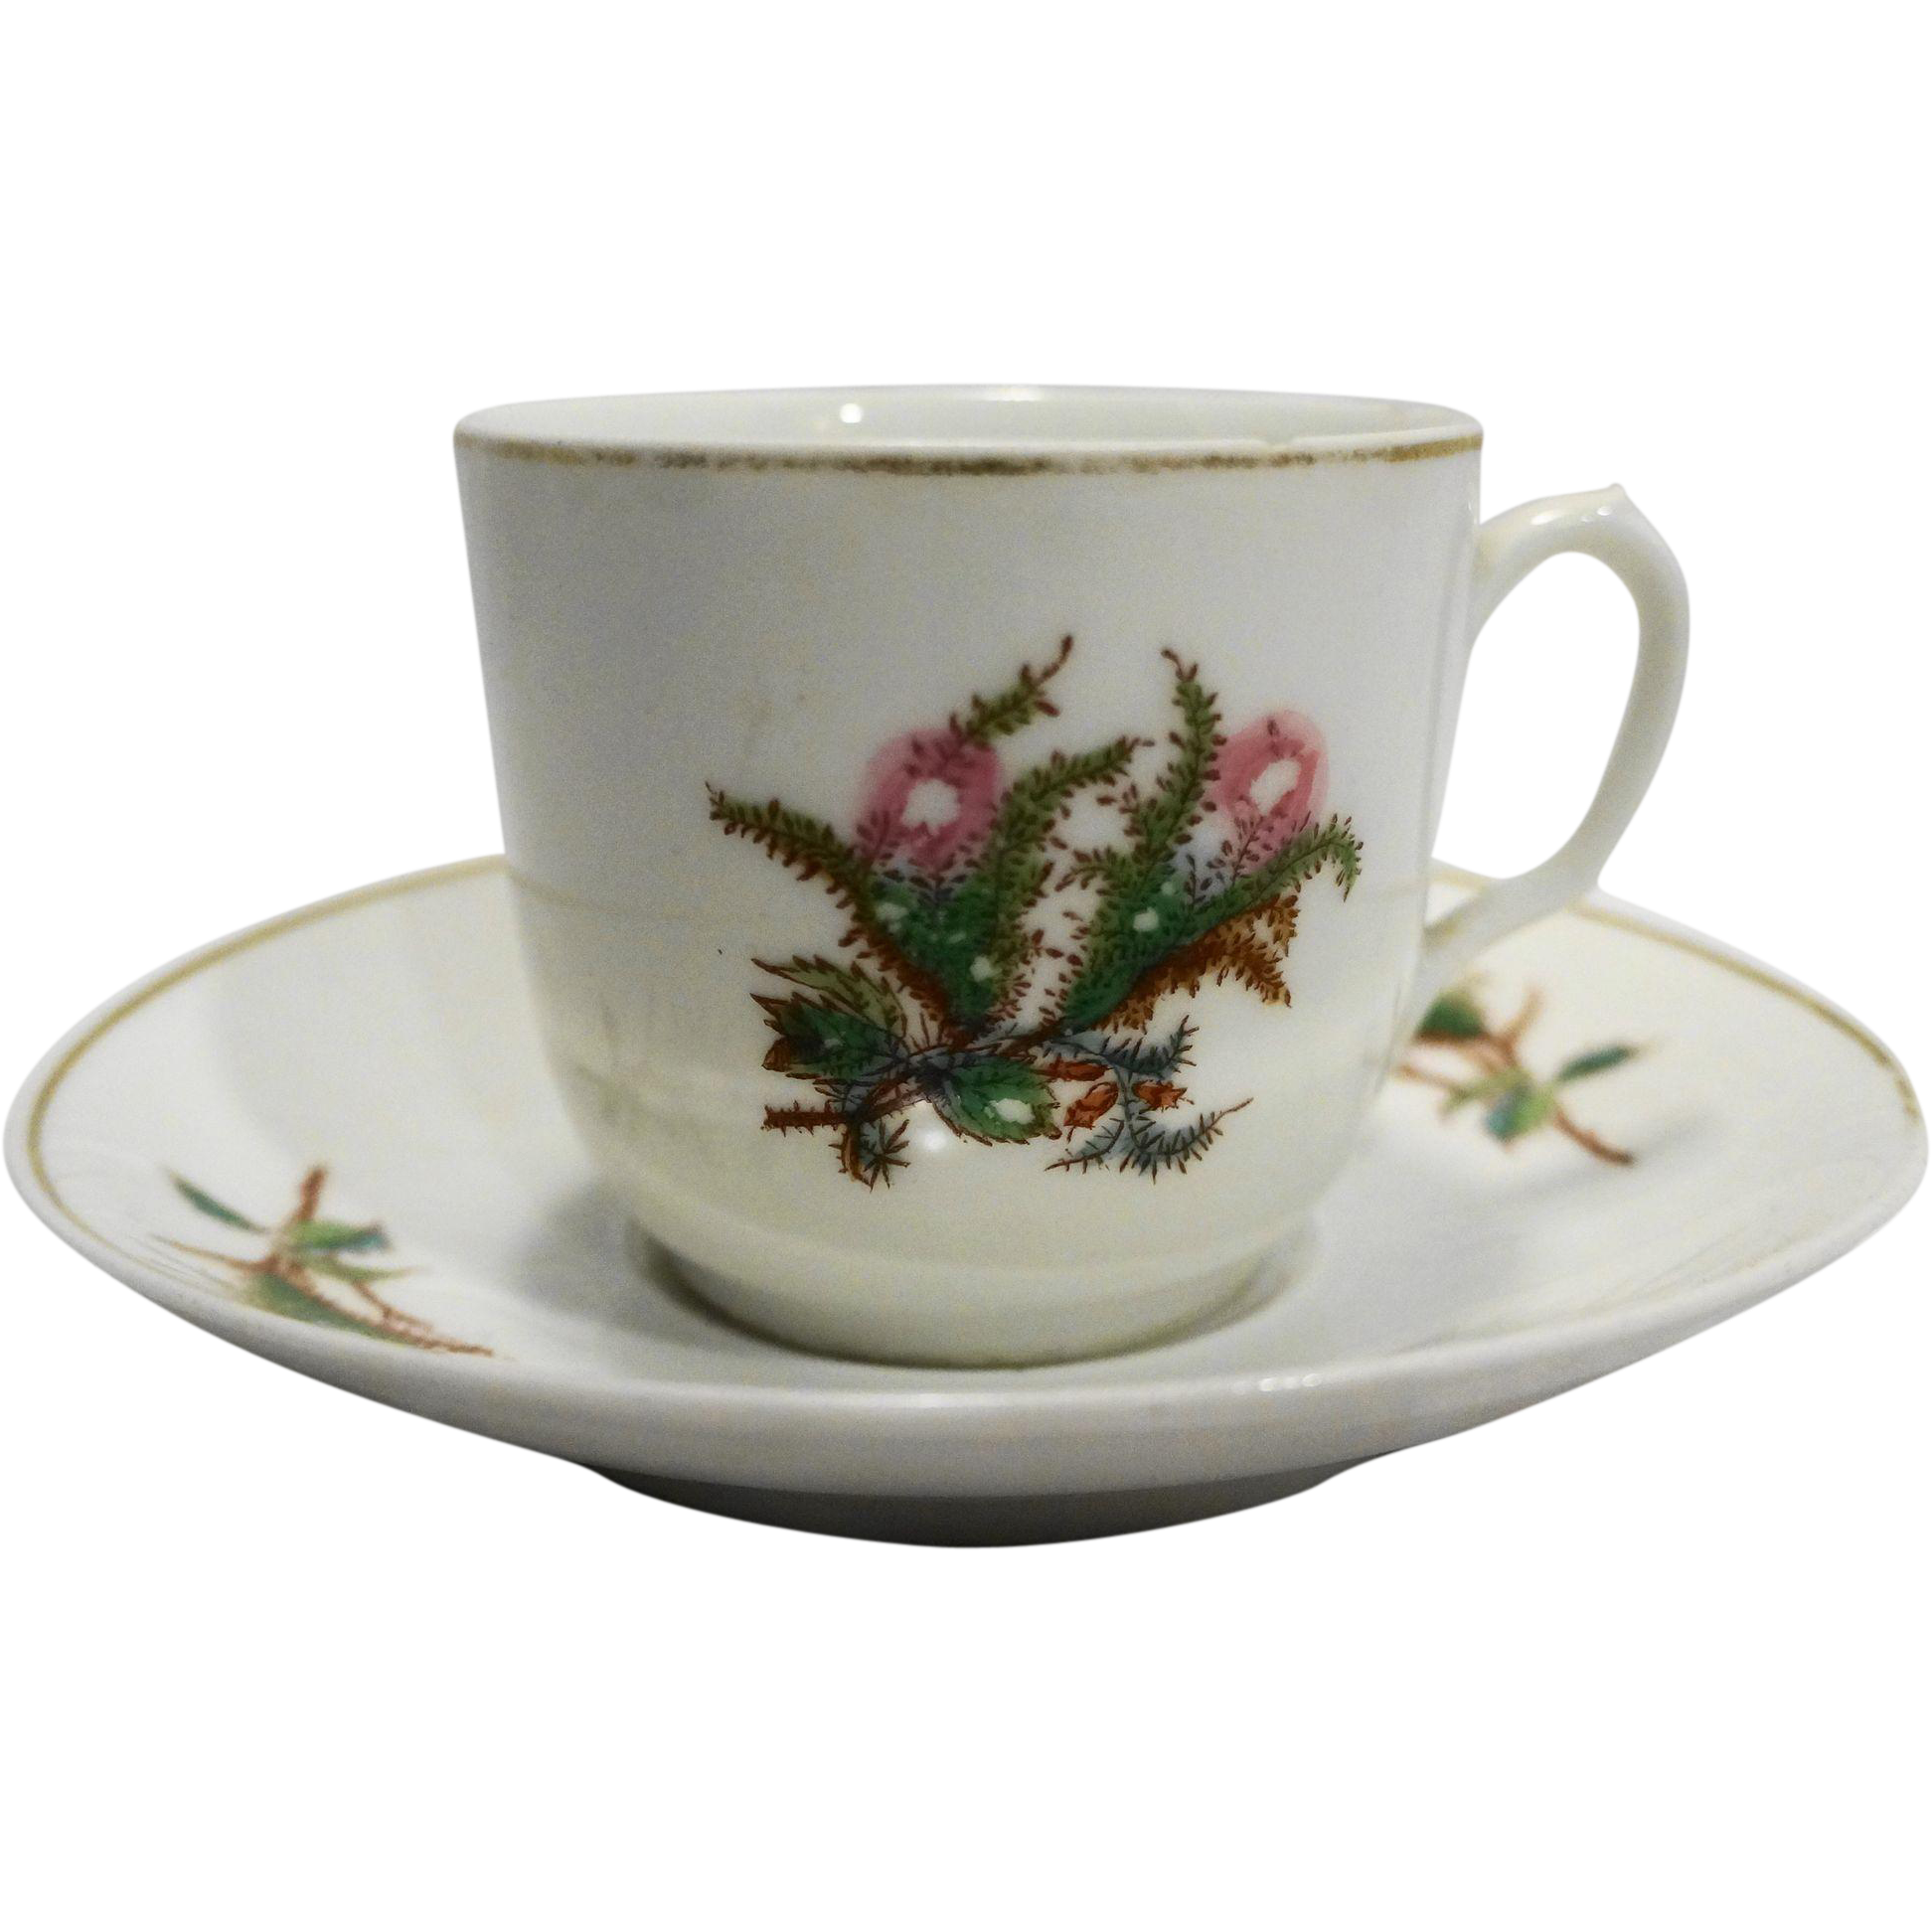 Charles Haviland Moss Rose Limoges Cup Saucer 1880s